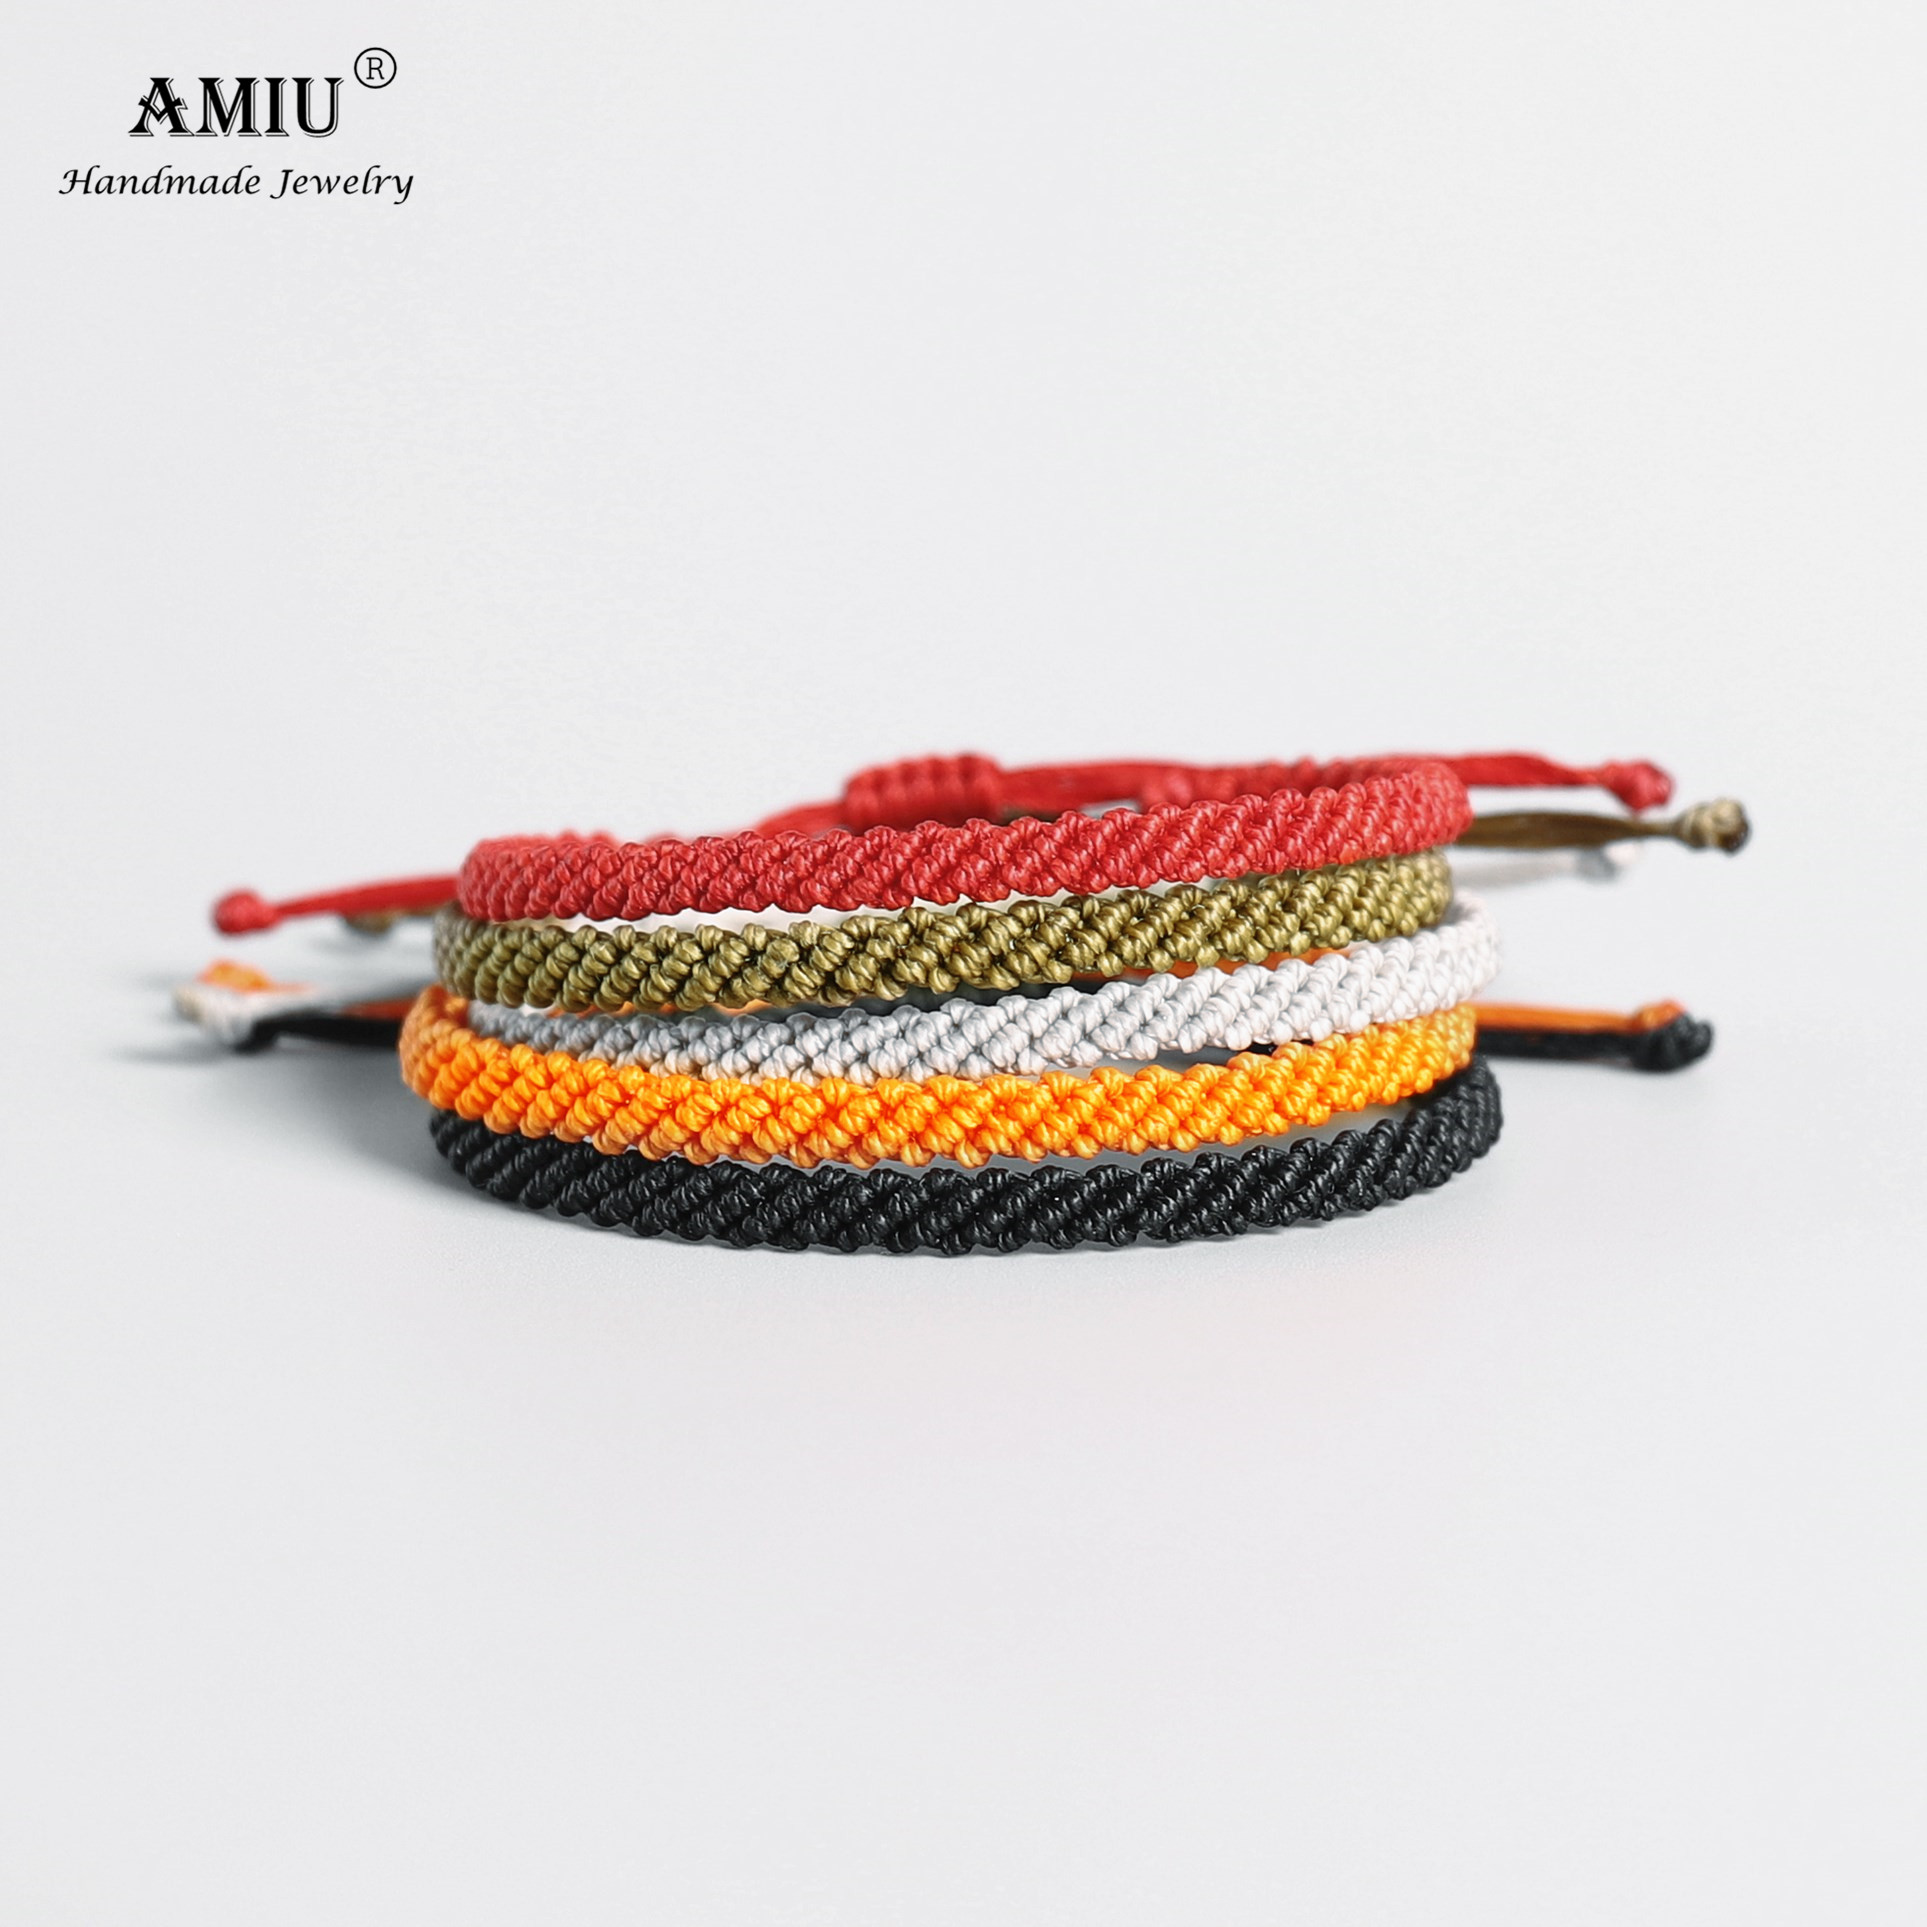 AMIU Handmade Waterproof Wax Thread Lucky Rope Bracelet & Bangles For Women Men Wax Thread Macrame Bracelets